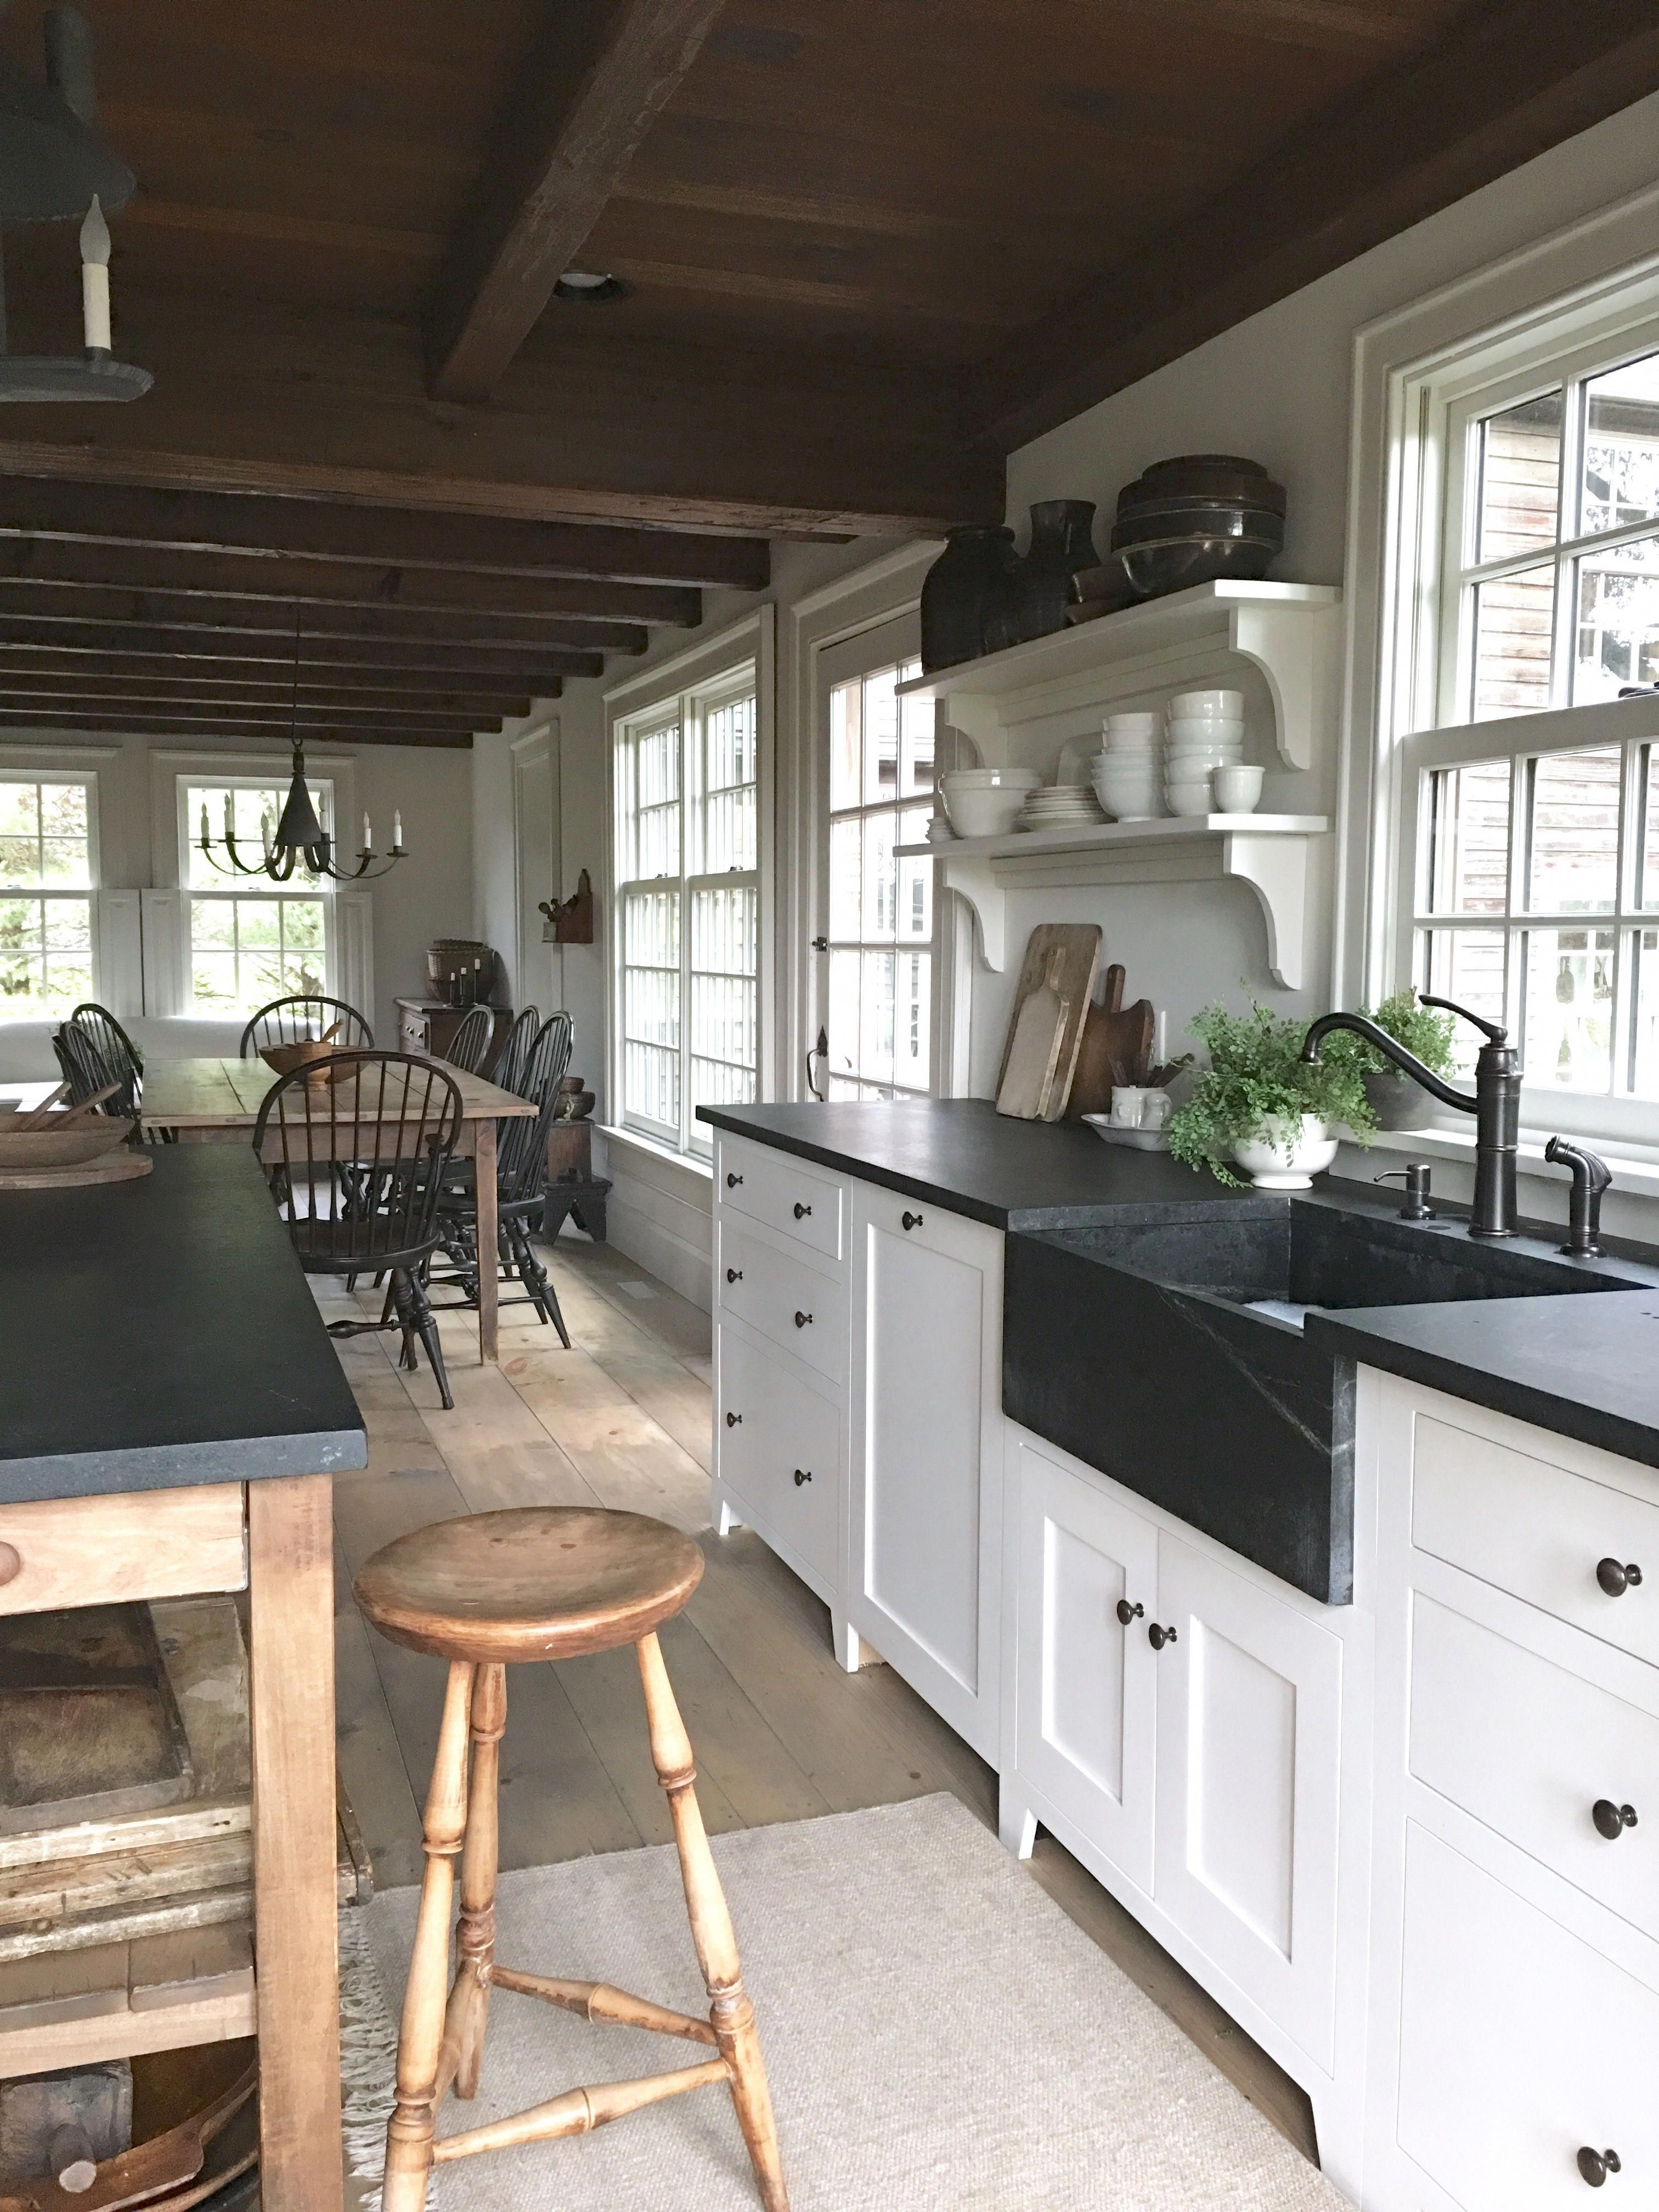 Primitive Kitchen Signs Primitivekitchen English Country Kitchens French Country Kitchens Colonial Kitchen